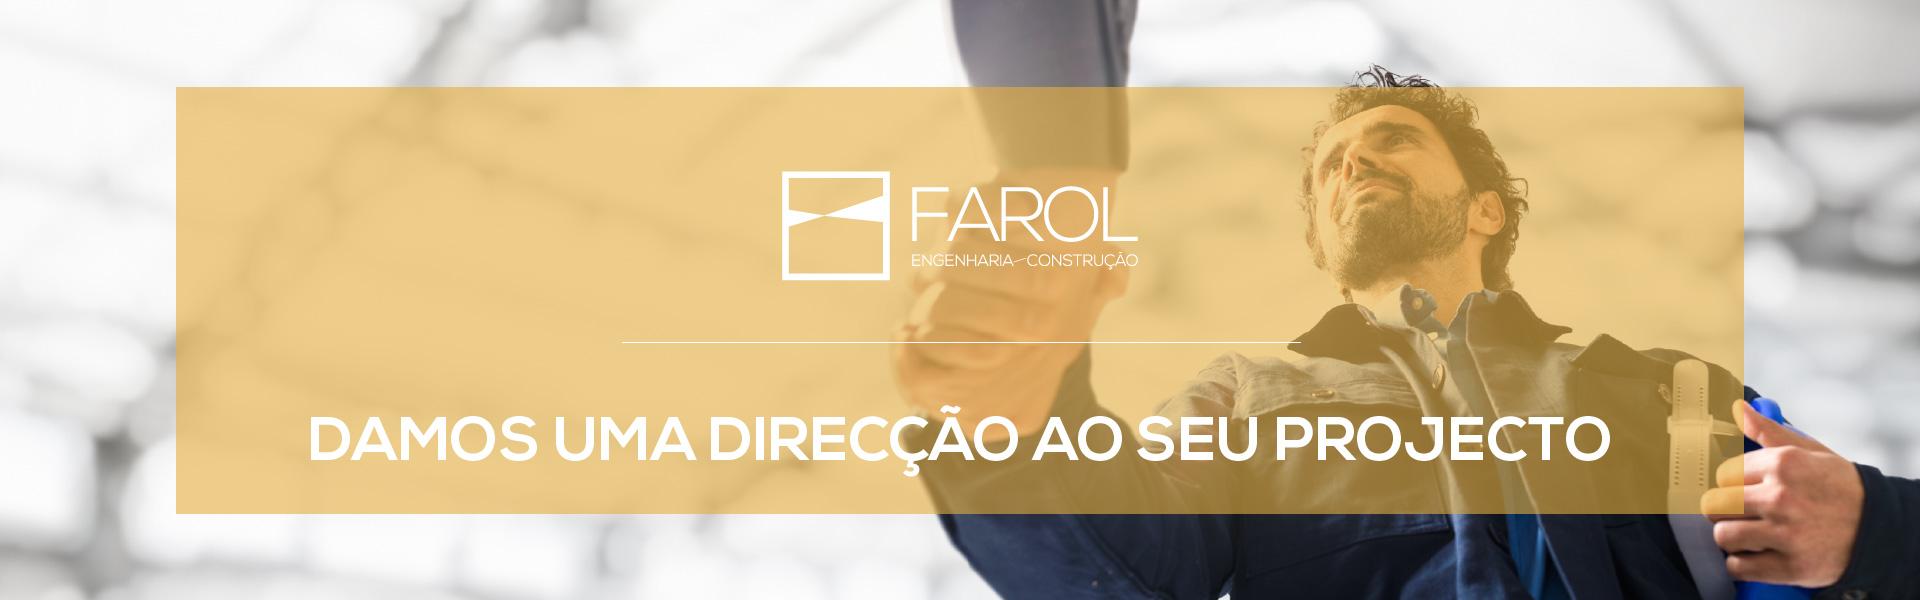 banner_farol_2